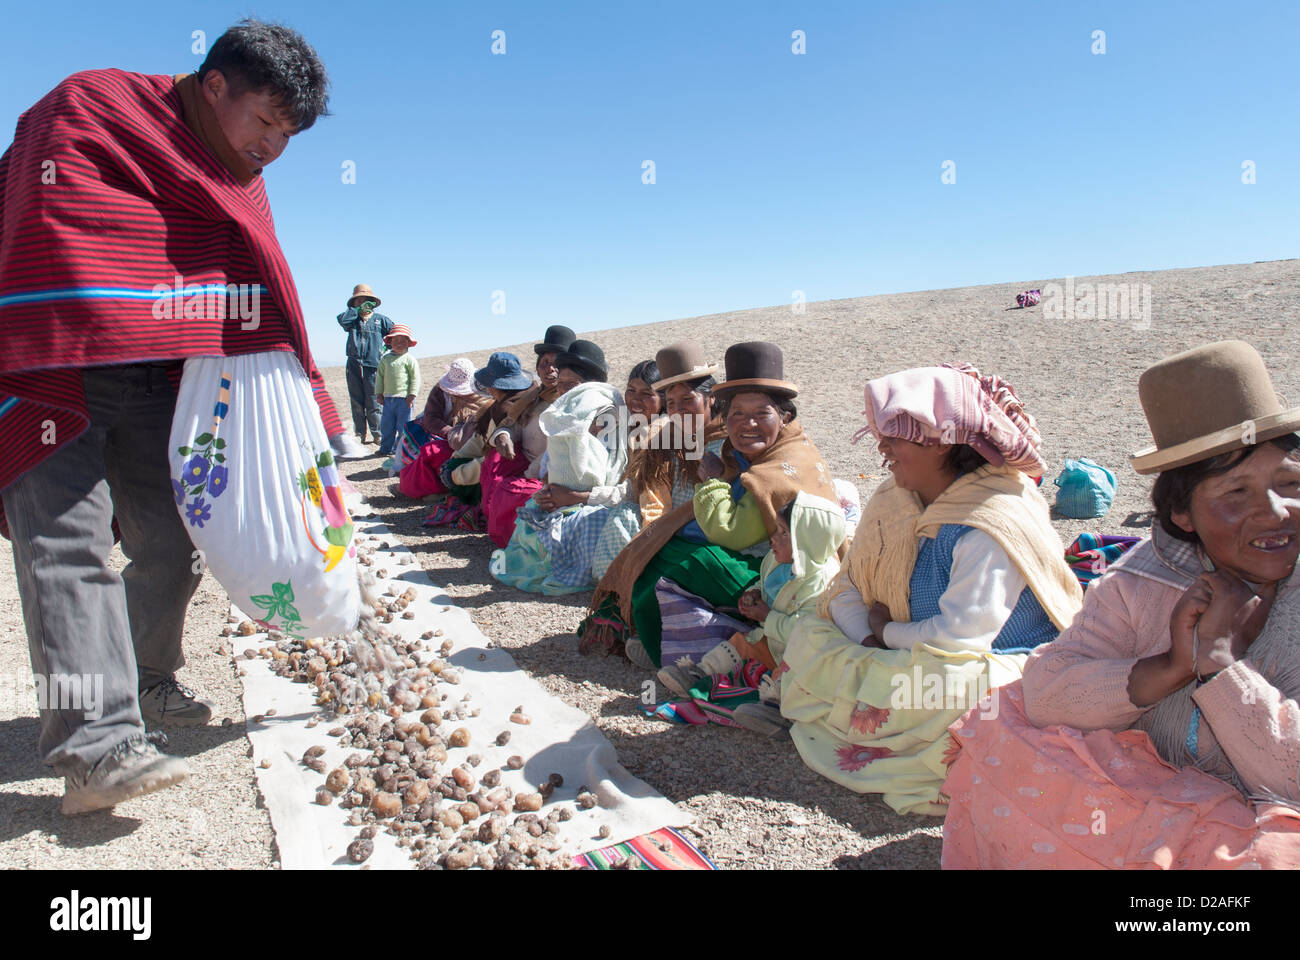 Aymara lunch in the Cordillera - Stock Image